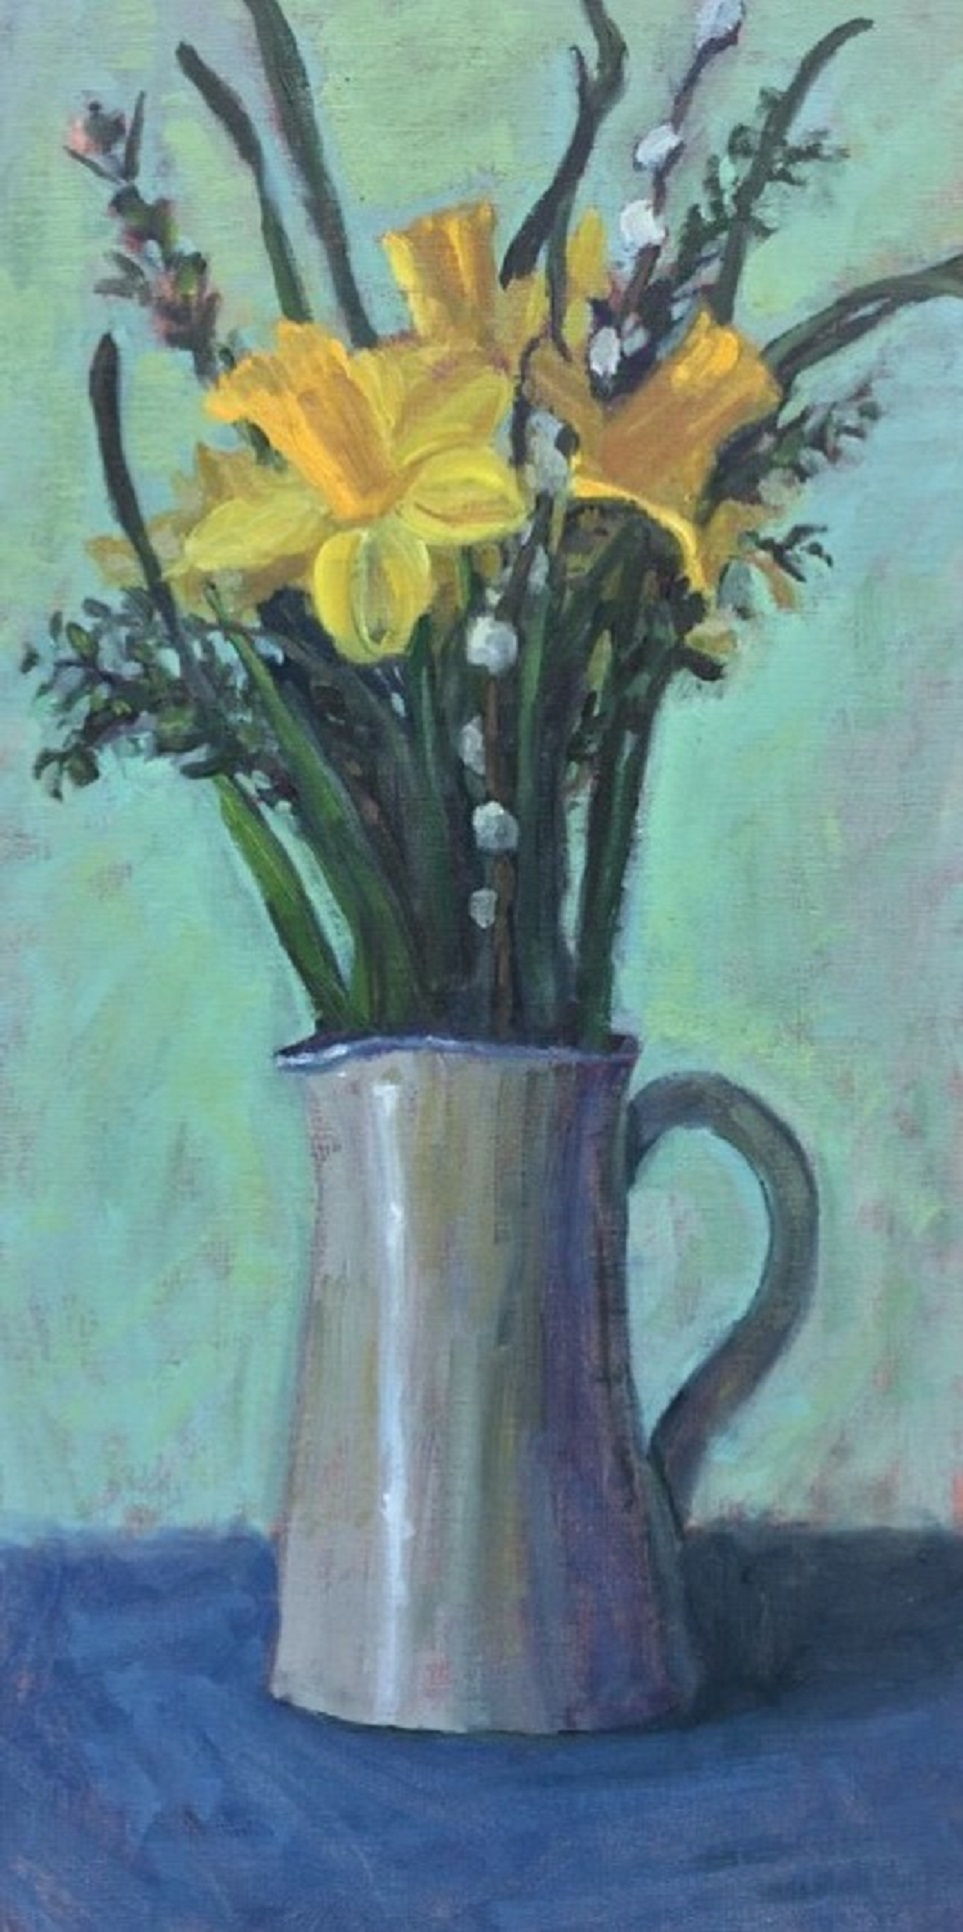 Yellow Daffodils on Tabletop.JPG